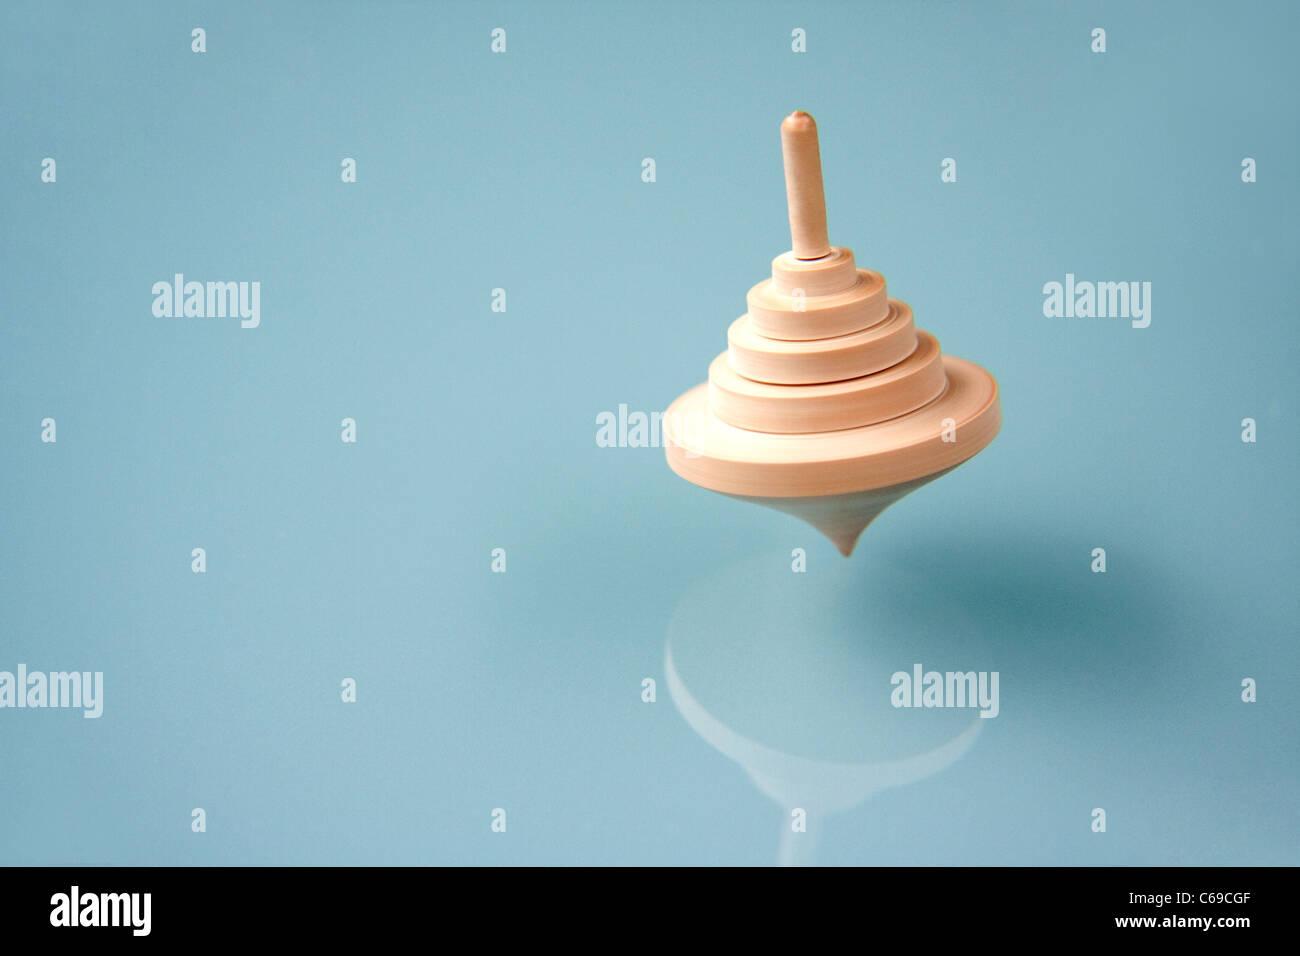 Spinning Top Spielzeug Stockbild